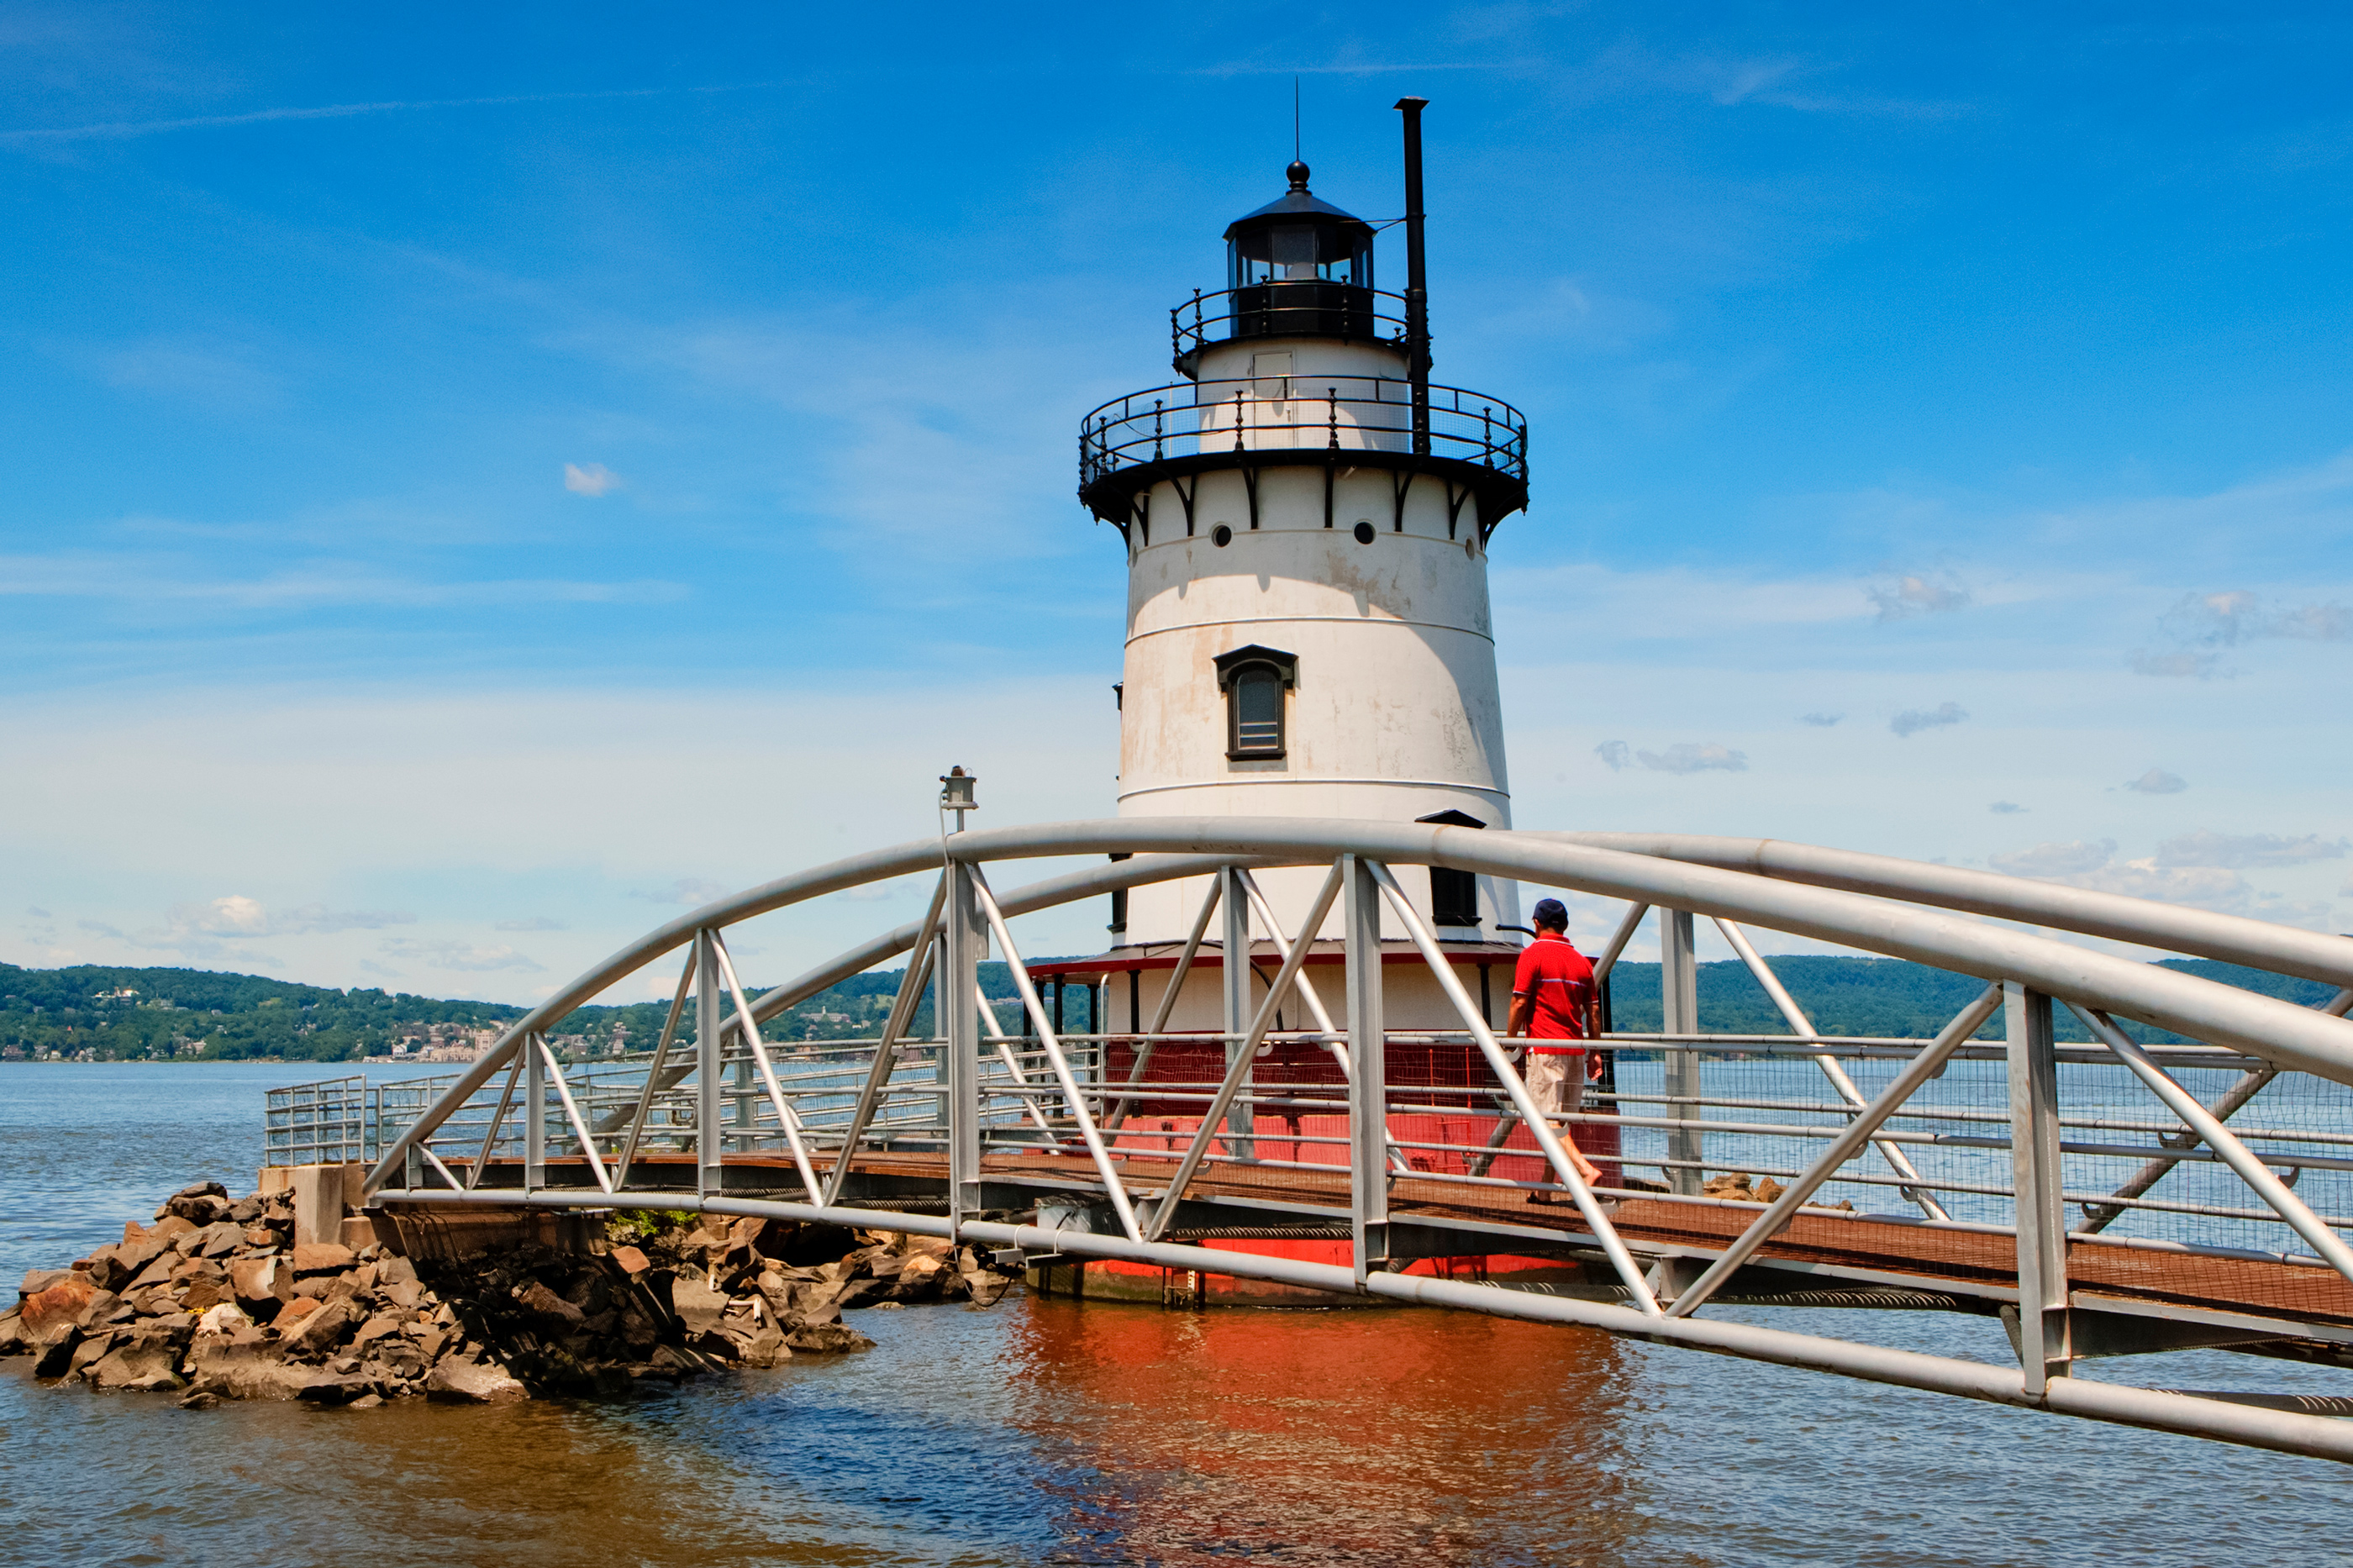 Sleepy Hollow Lighthouse, Sleepy Hollow, New York